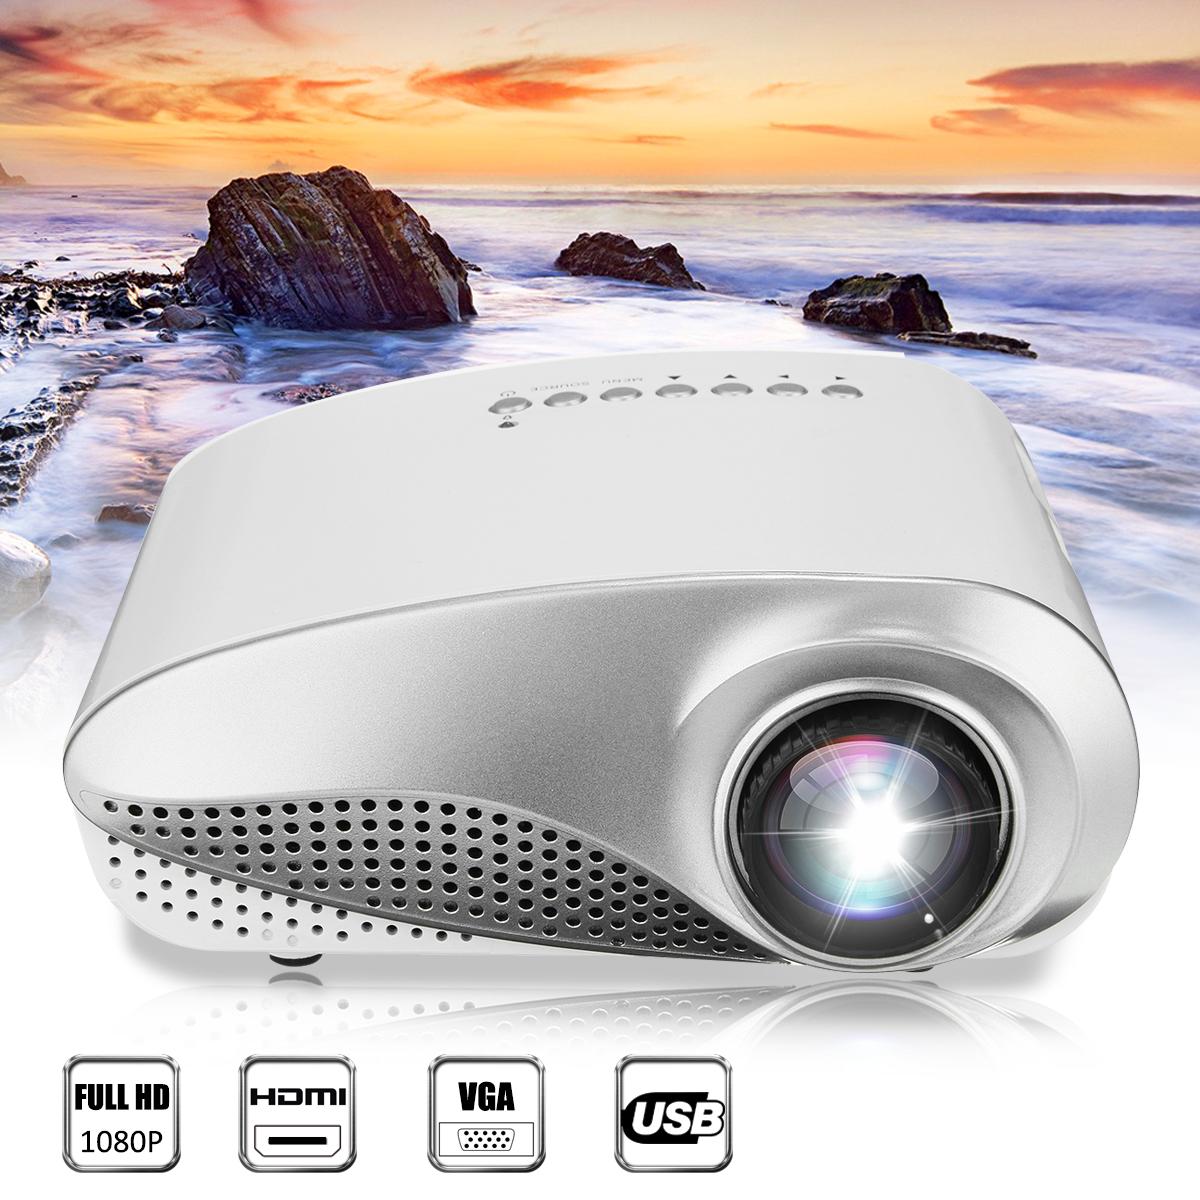 3D 1080P Portable LCD LED Mini Projector 600 Lumens 480x320 USB VGA TV AV Office Home Theater